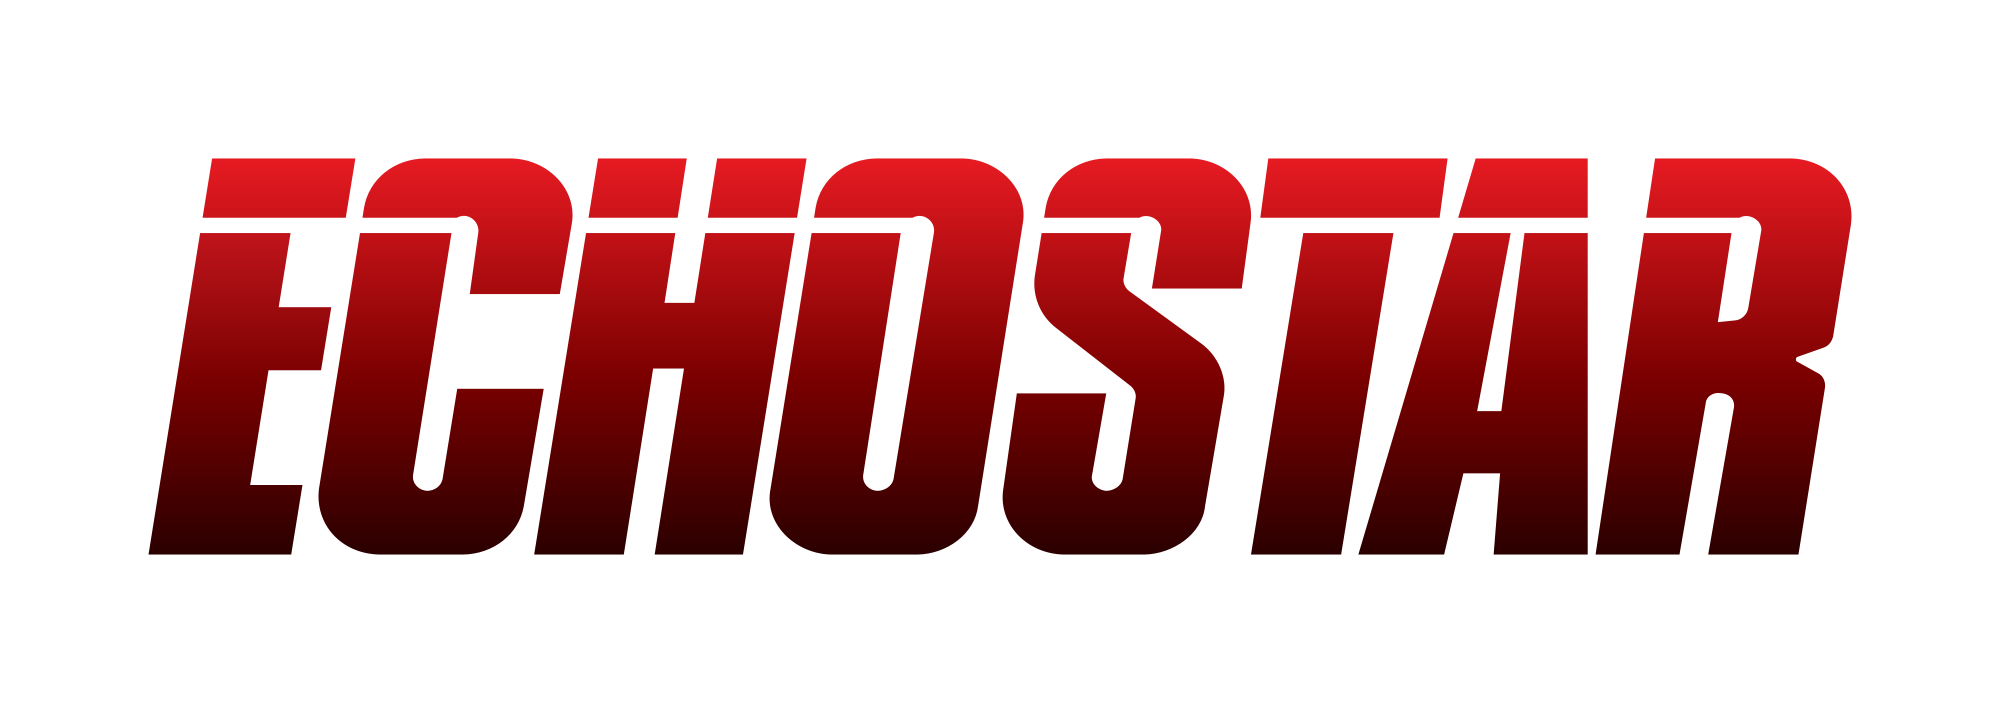 ECHOSTAR